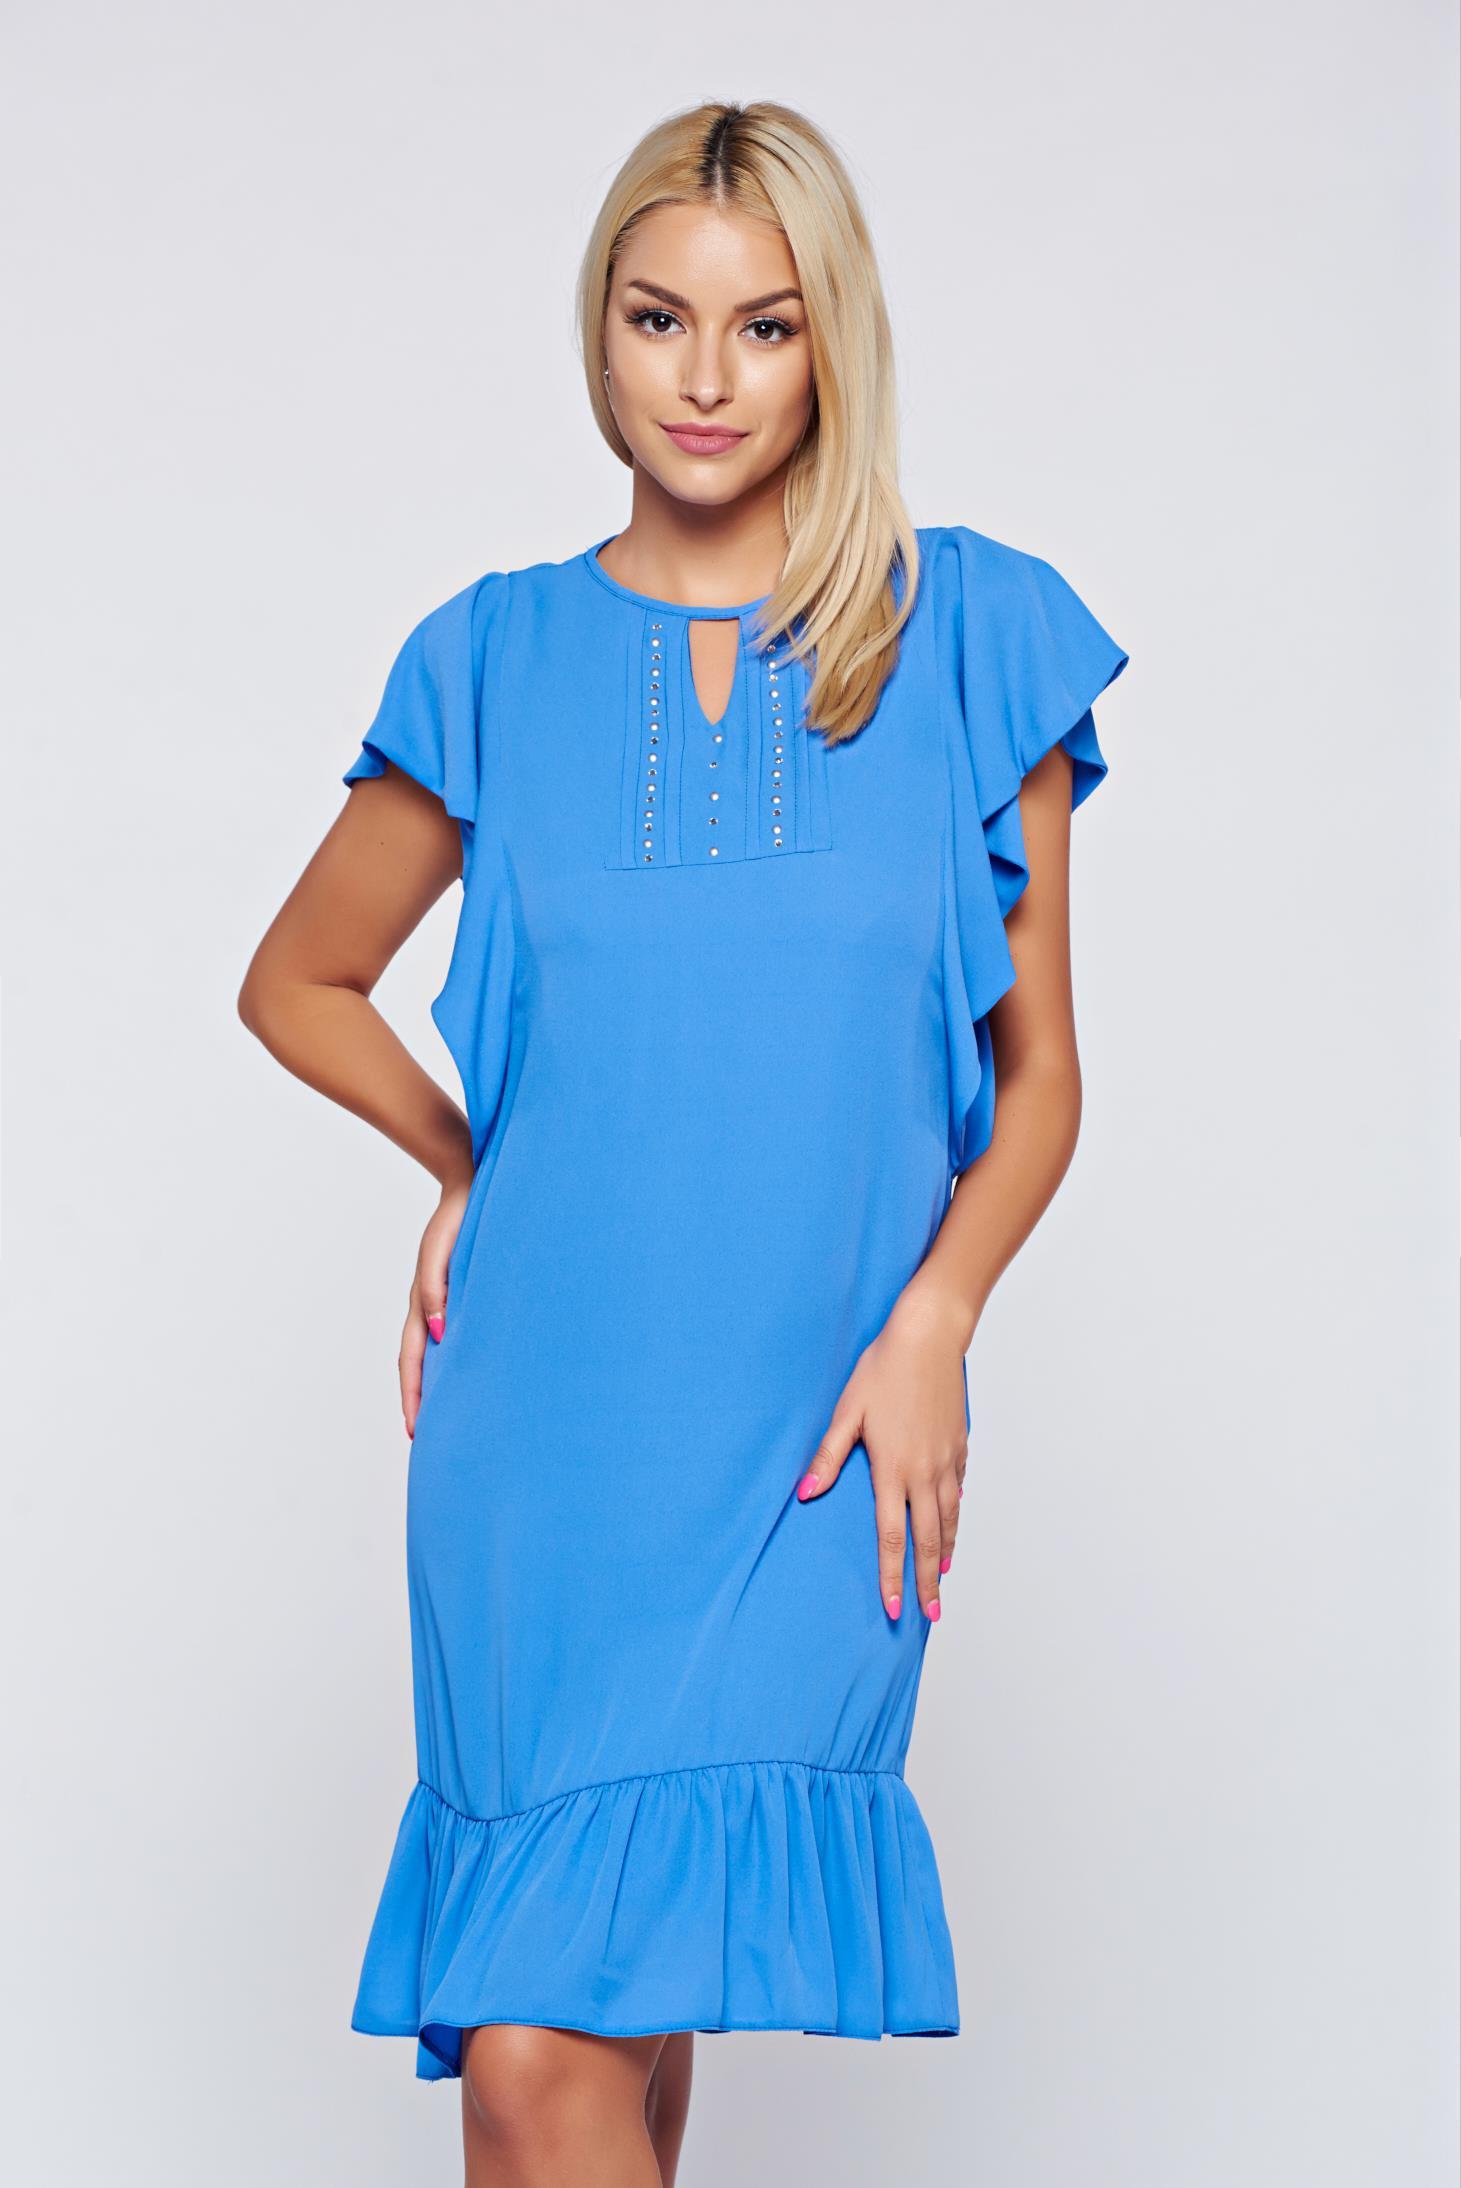 Rochie LaDonna albastra-deschis din voal cu croi larg cu aplicatii cu margele